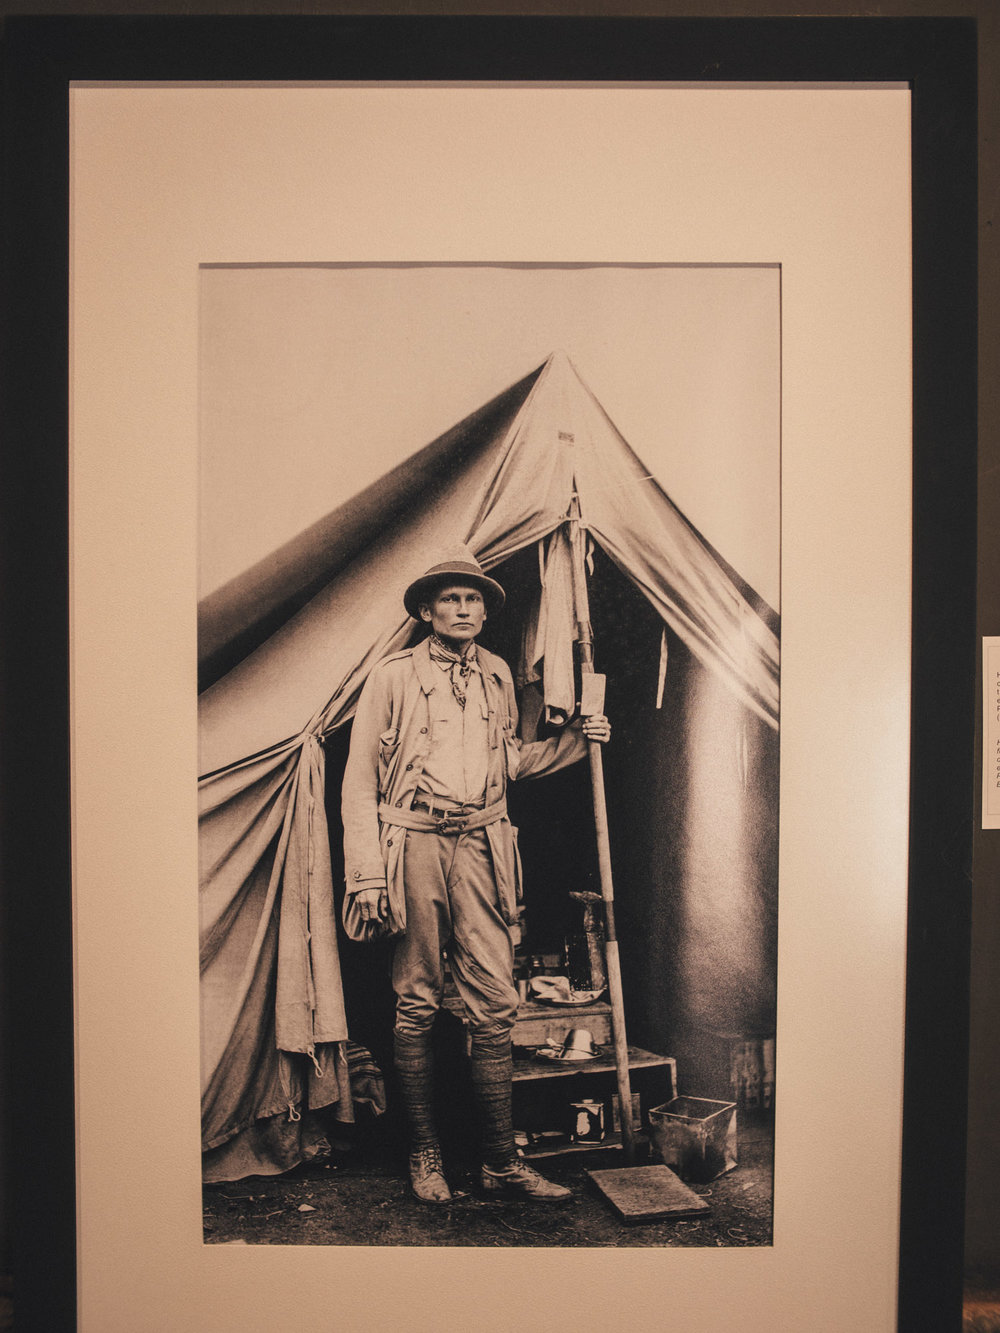 Hiram Bingham, who discovered Machu Picchu in 1911